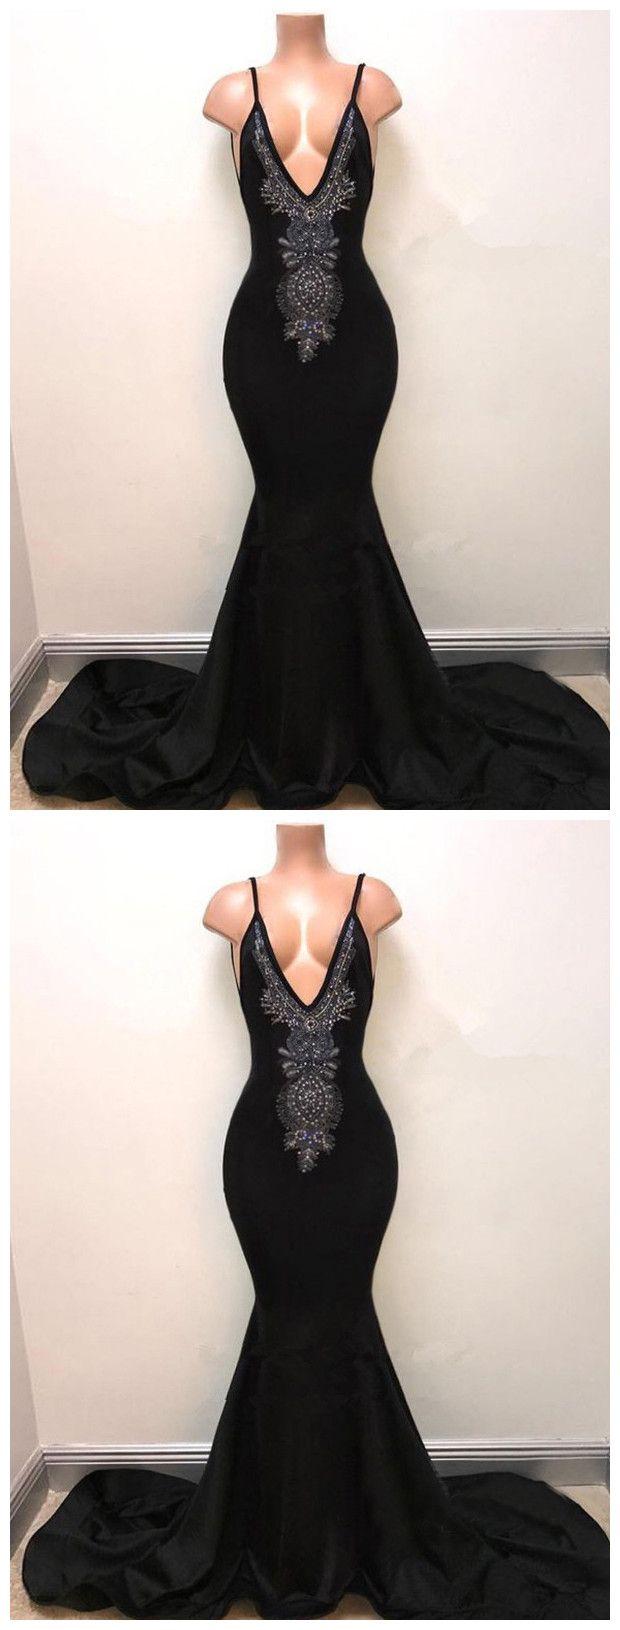 Trumpetmermaid black spaghetti strap sleeveless prom dress beading